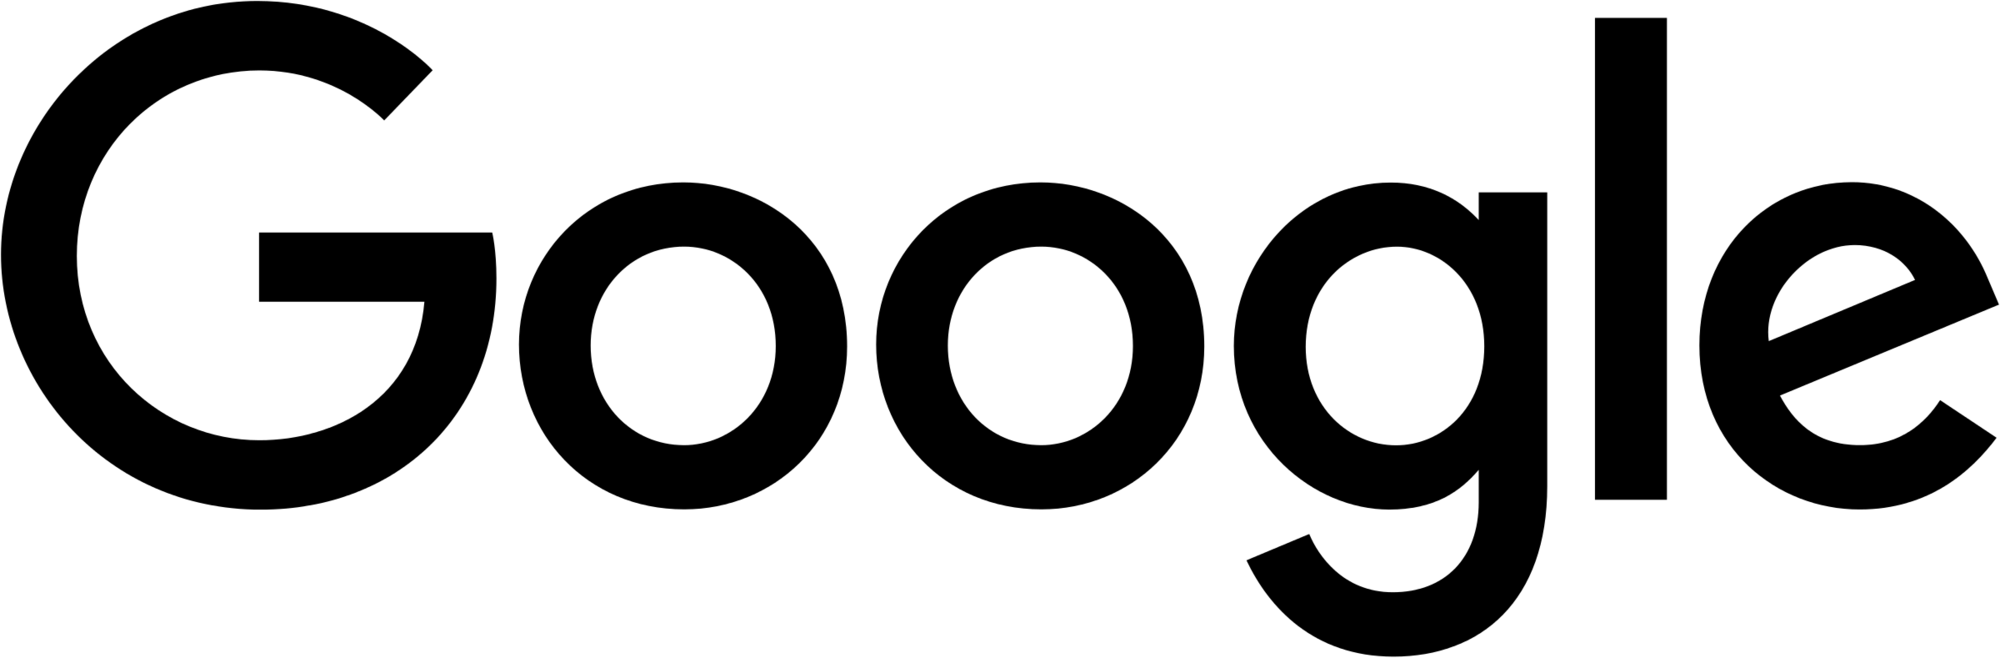 Google Logo Black Backgrounds - Wallpaper Cave - Google Logo Themes